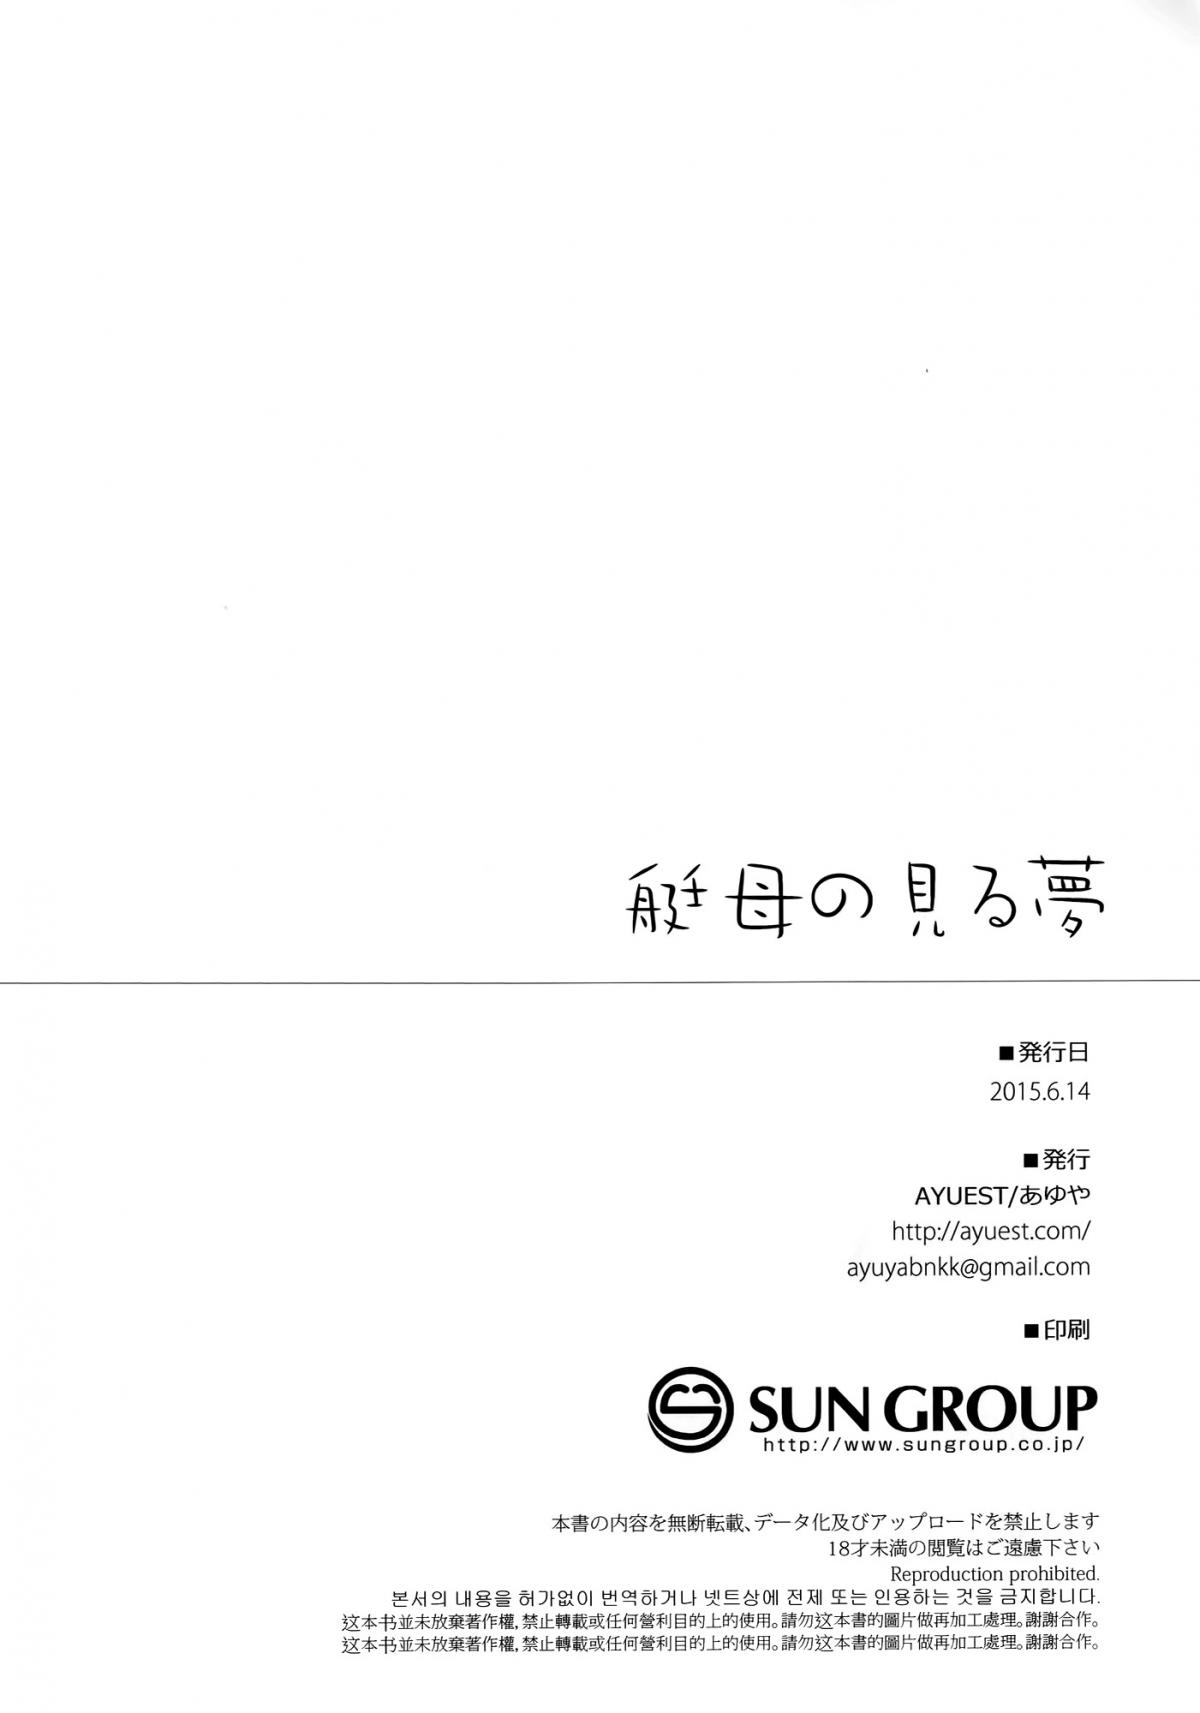 HentaiVN.net - Ảnh 13 - 艇母の見る夢 - Oneshot